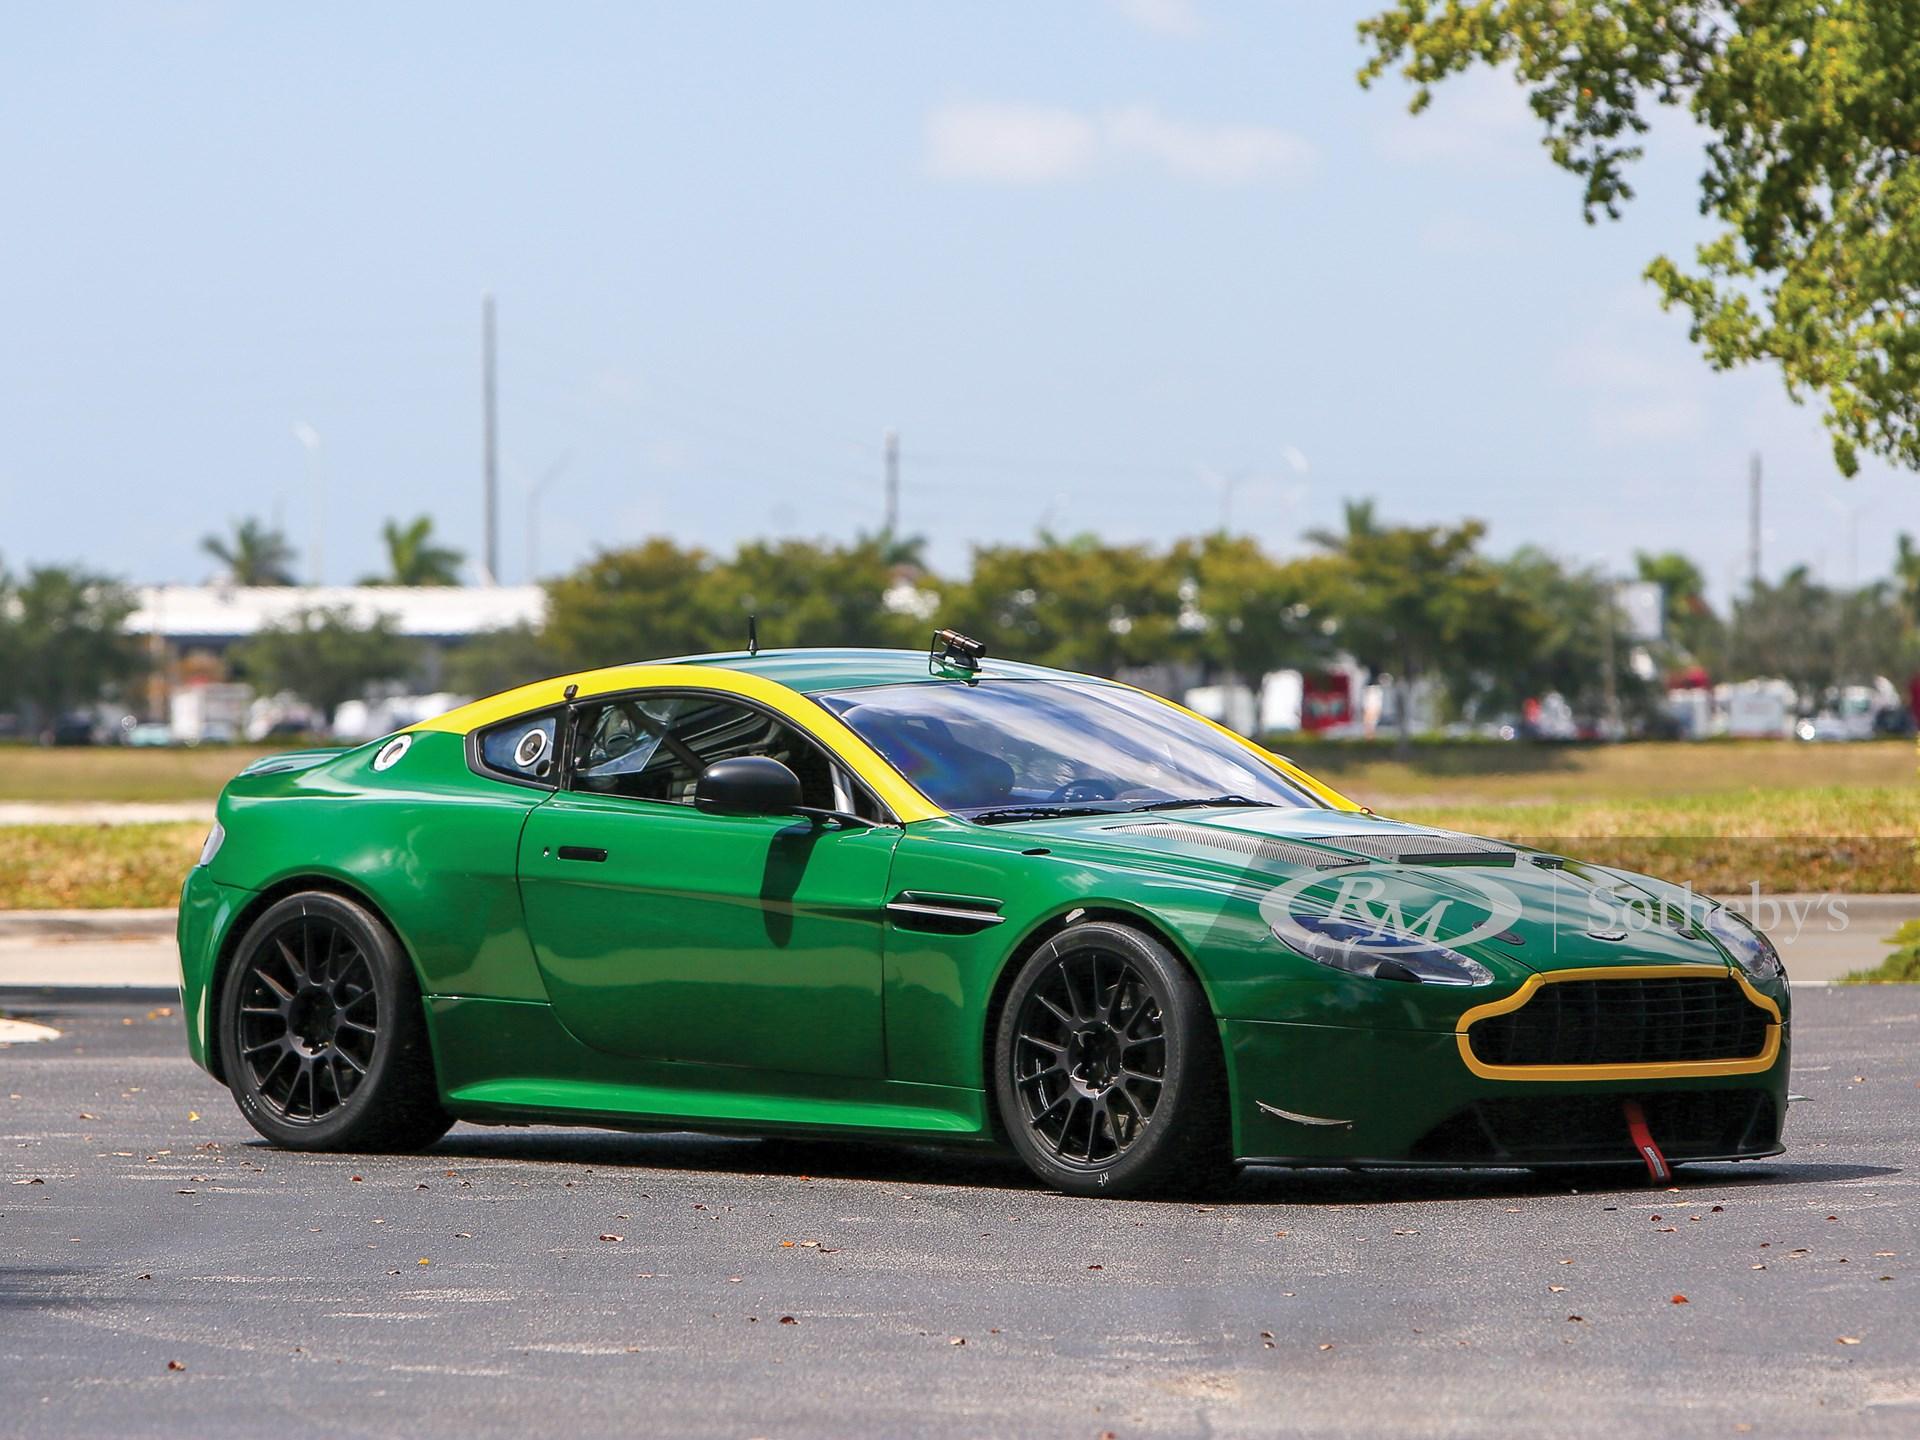 2010 Aston Martin V8 Vantage Gt4 Monterey 2019 Rm Sotheby S